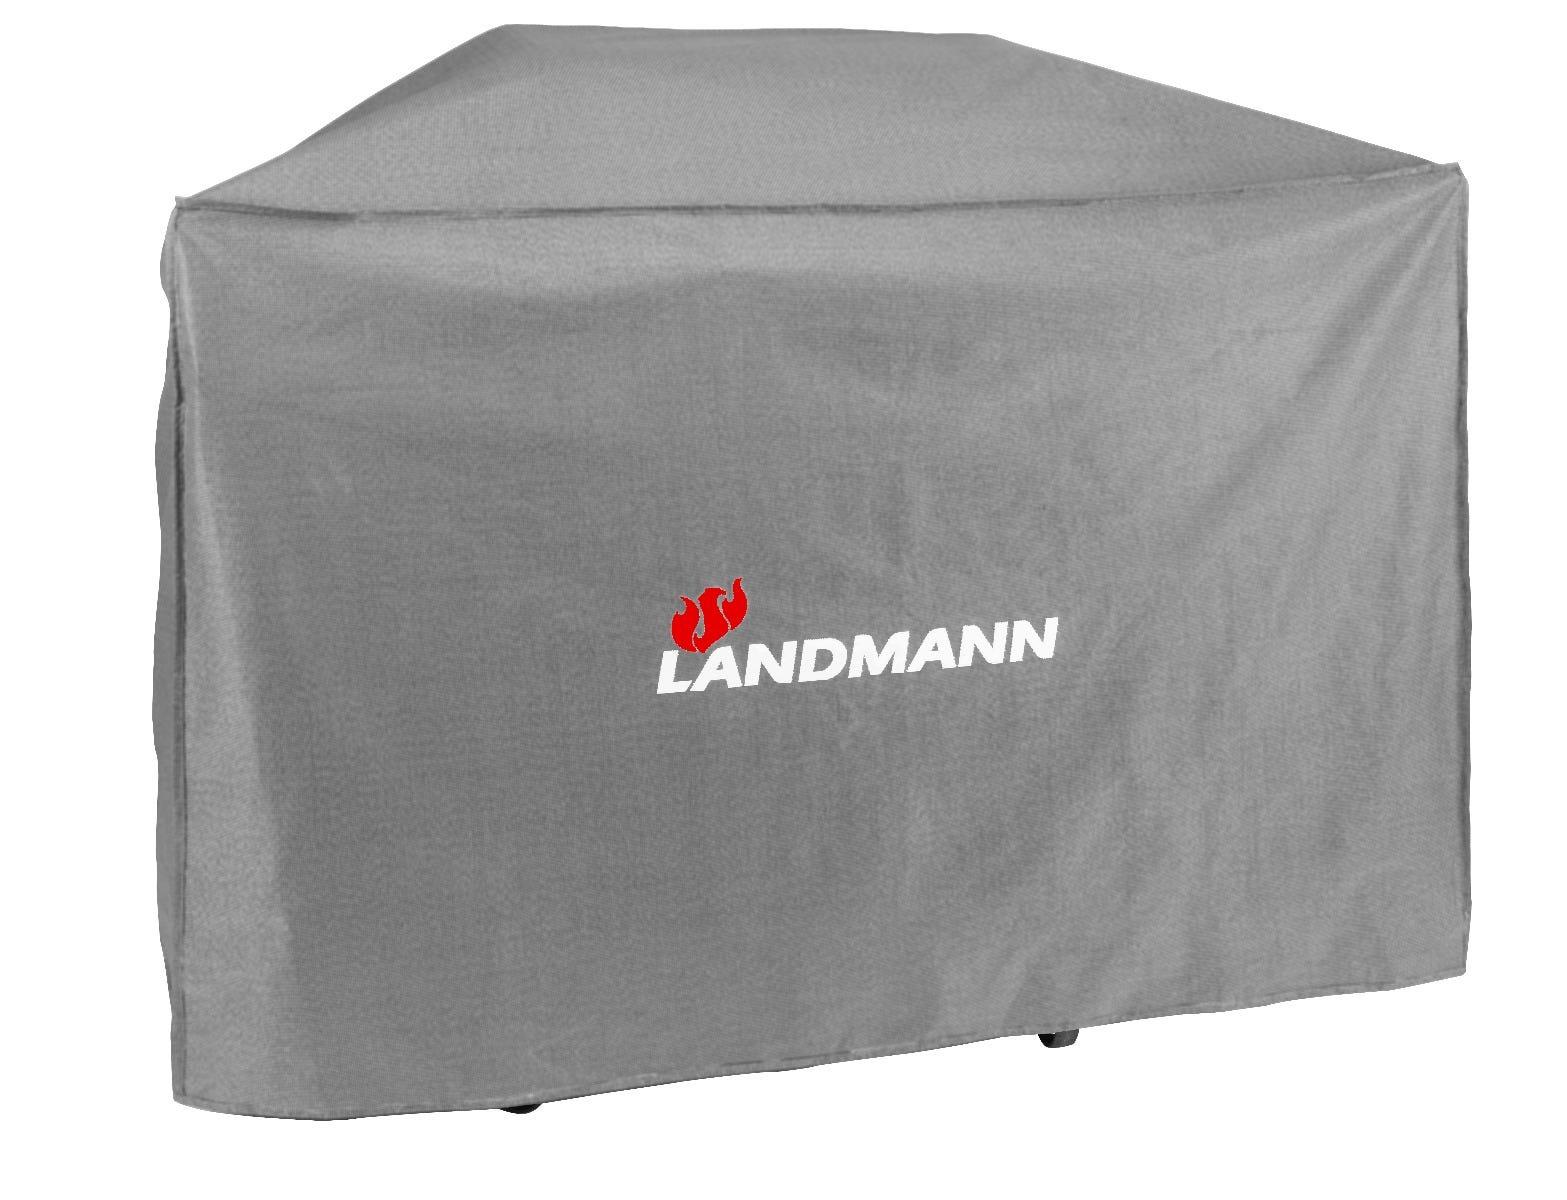 Landmann Grilltrekk Luksus L148xD62xH120 cm